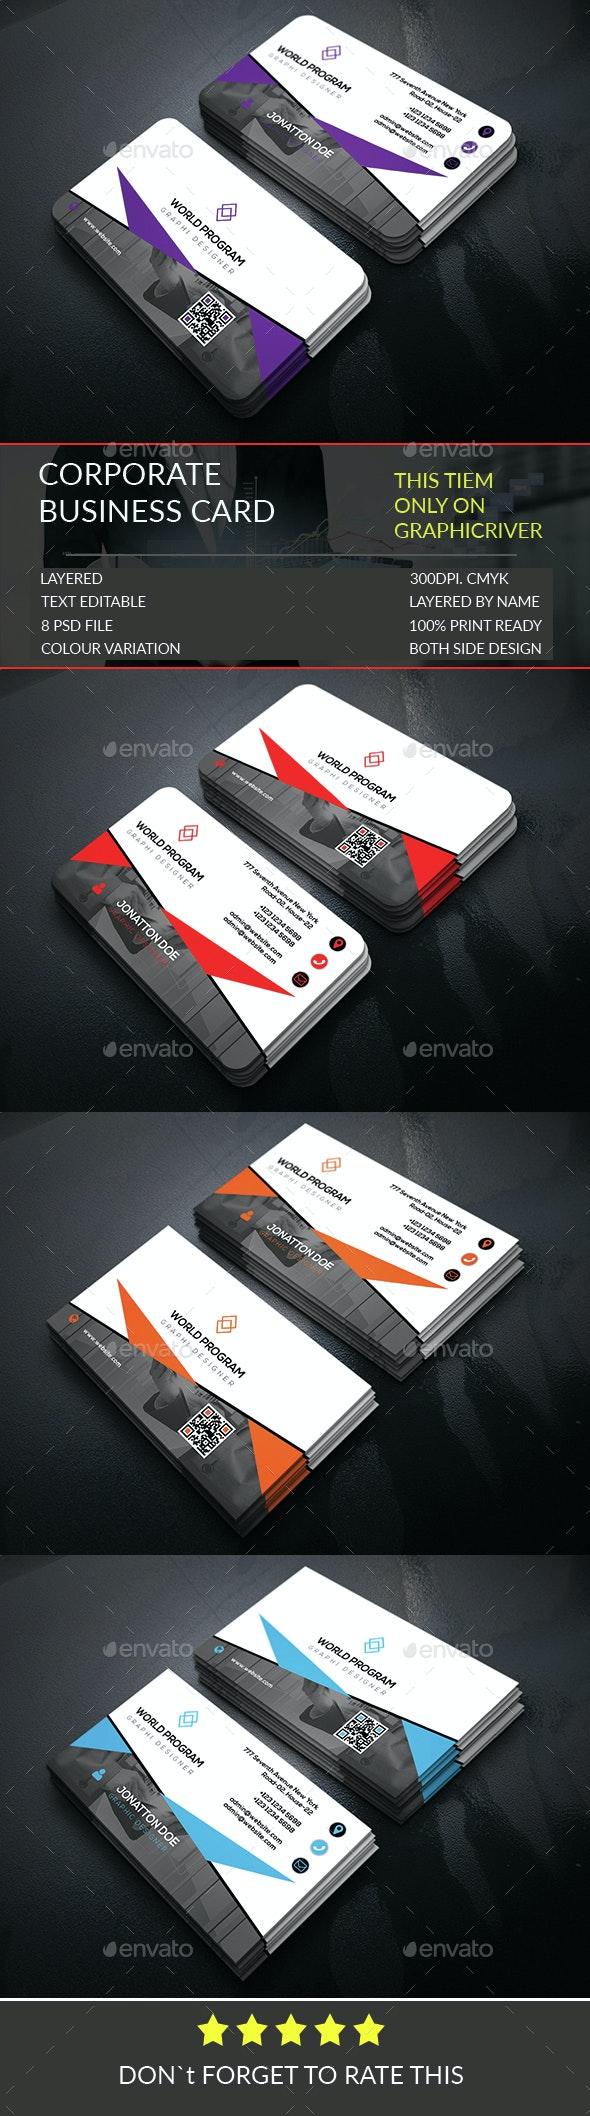 Corporate Business Card Template303 - Corporate Business Cards